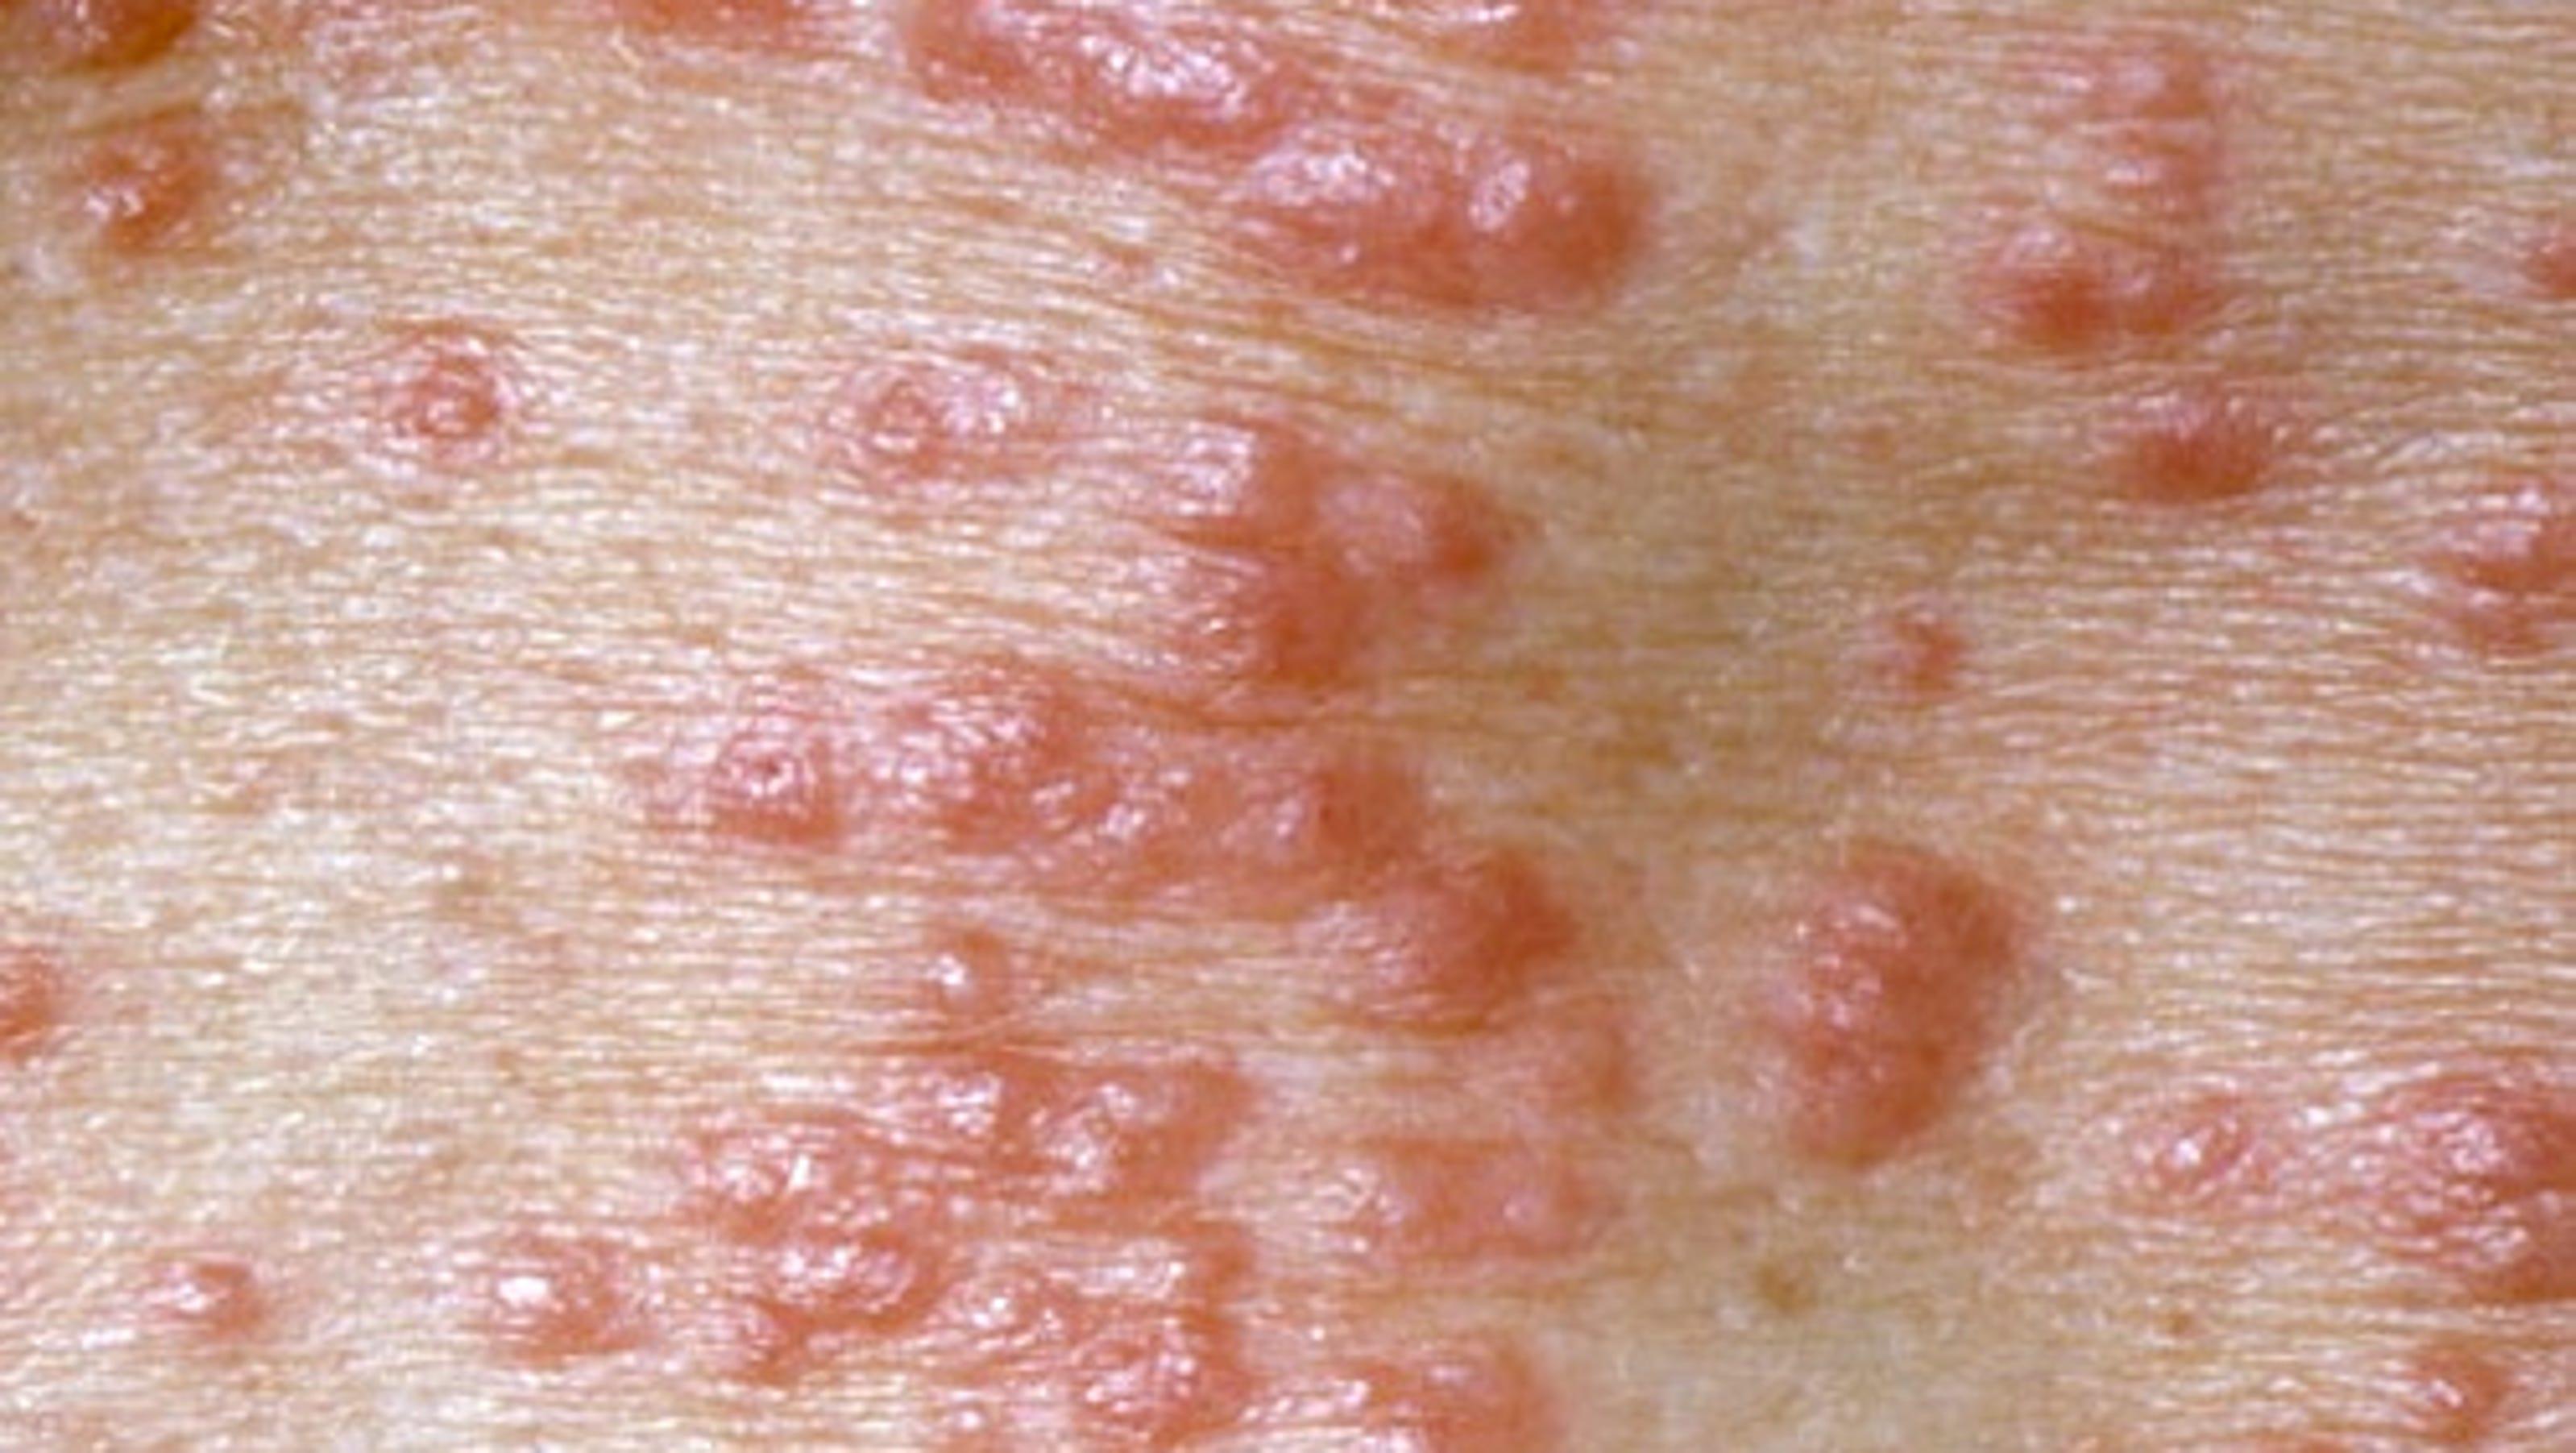 contagious skin disease